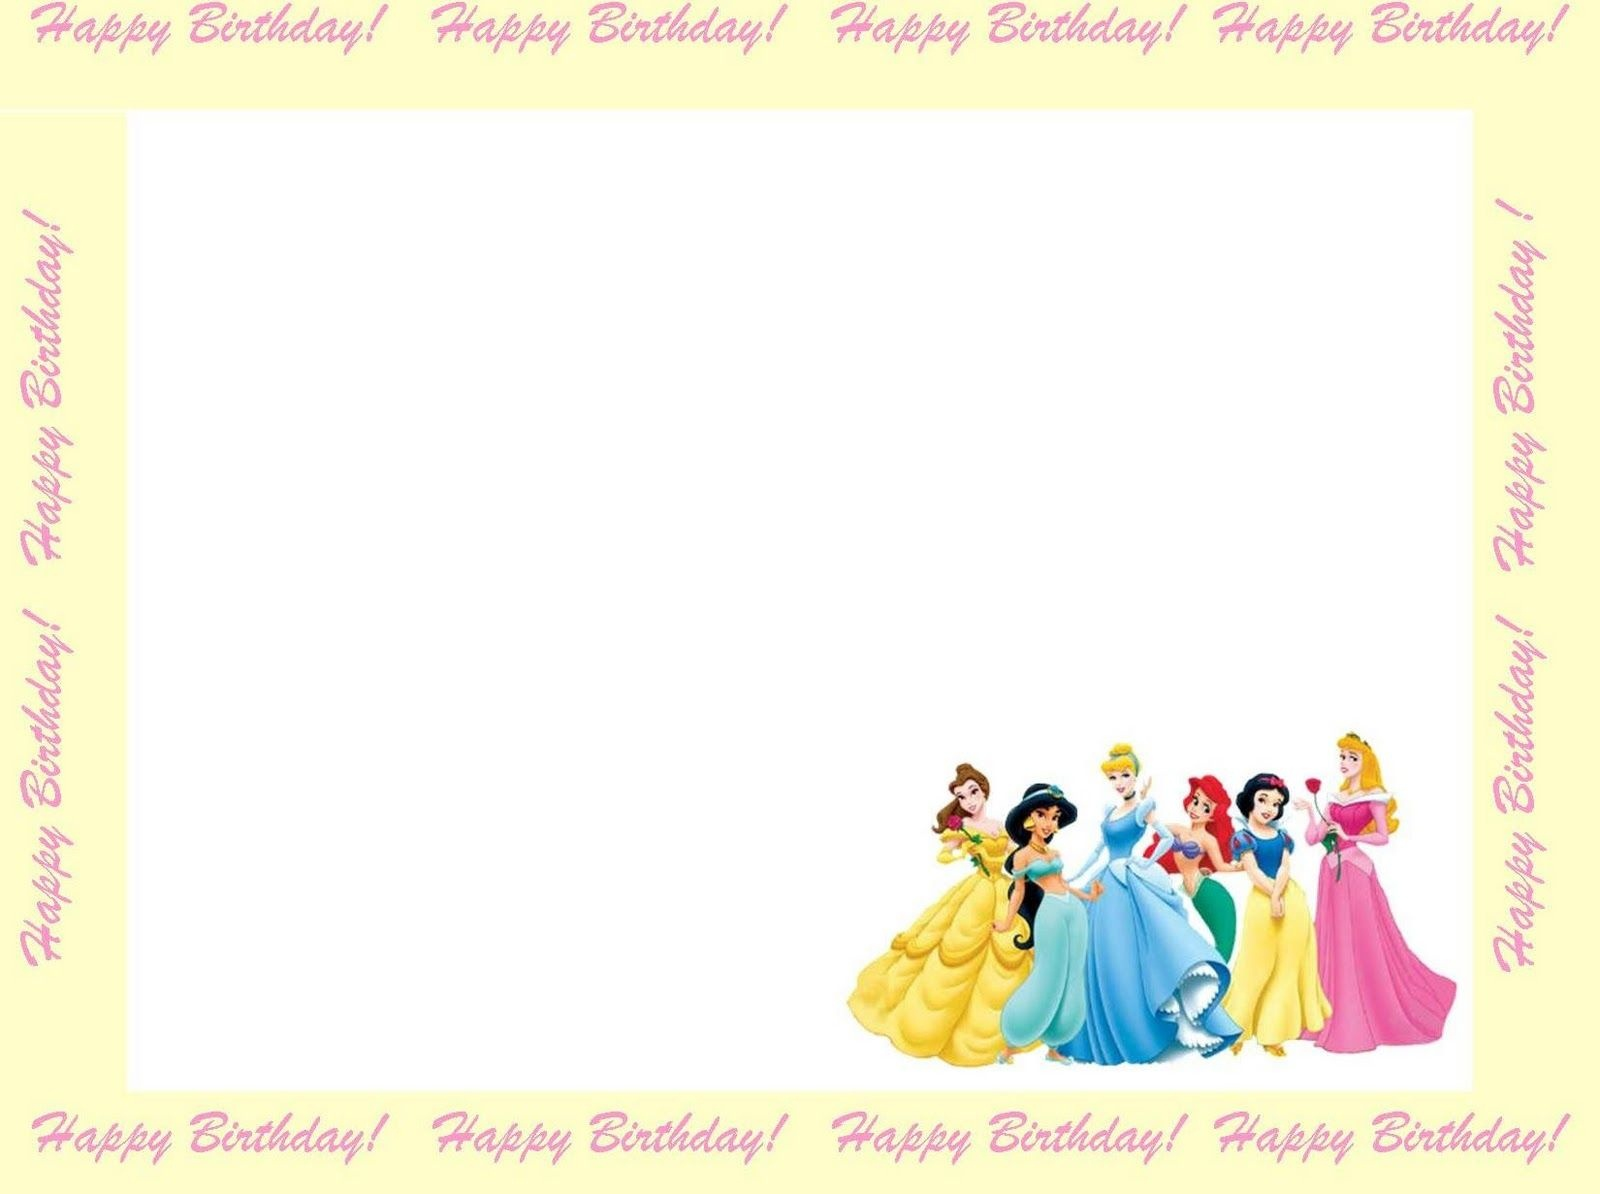 Free Princess Invitations To Print | Free Printable Disney Princess - Free Princess Printable Invitations